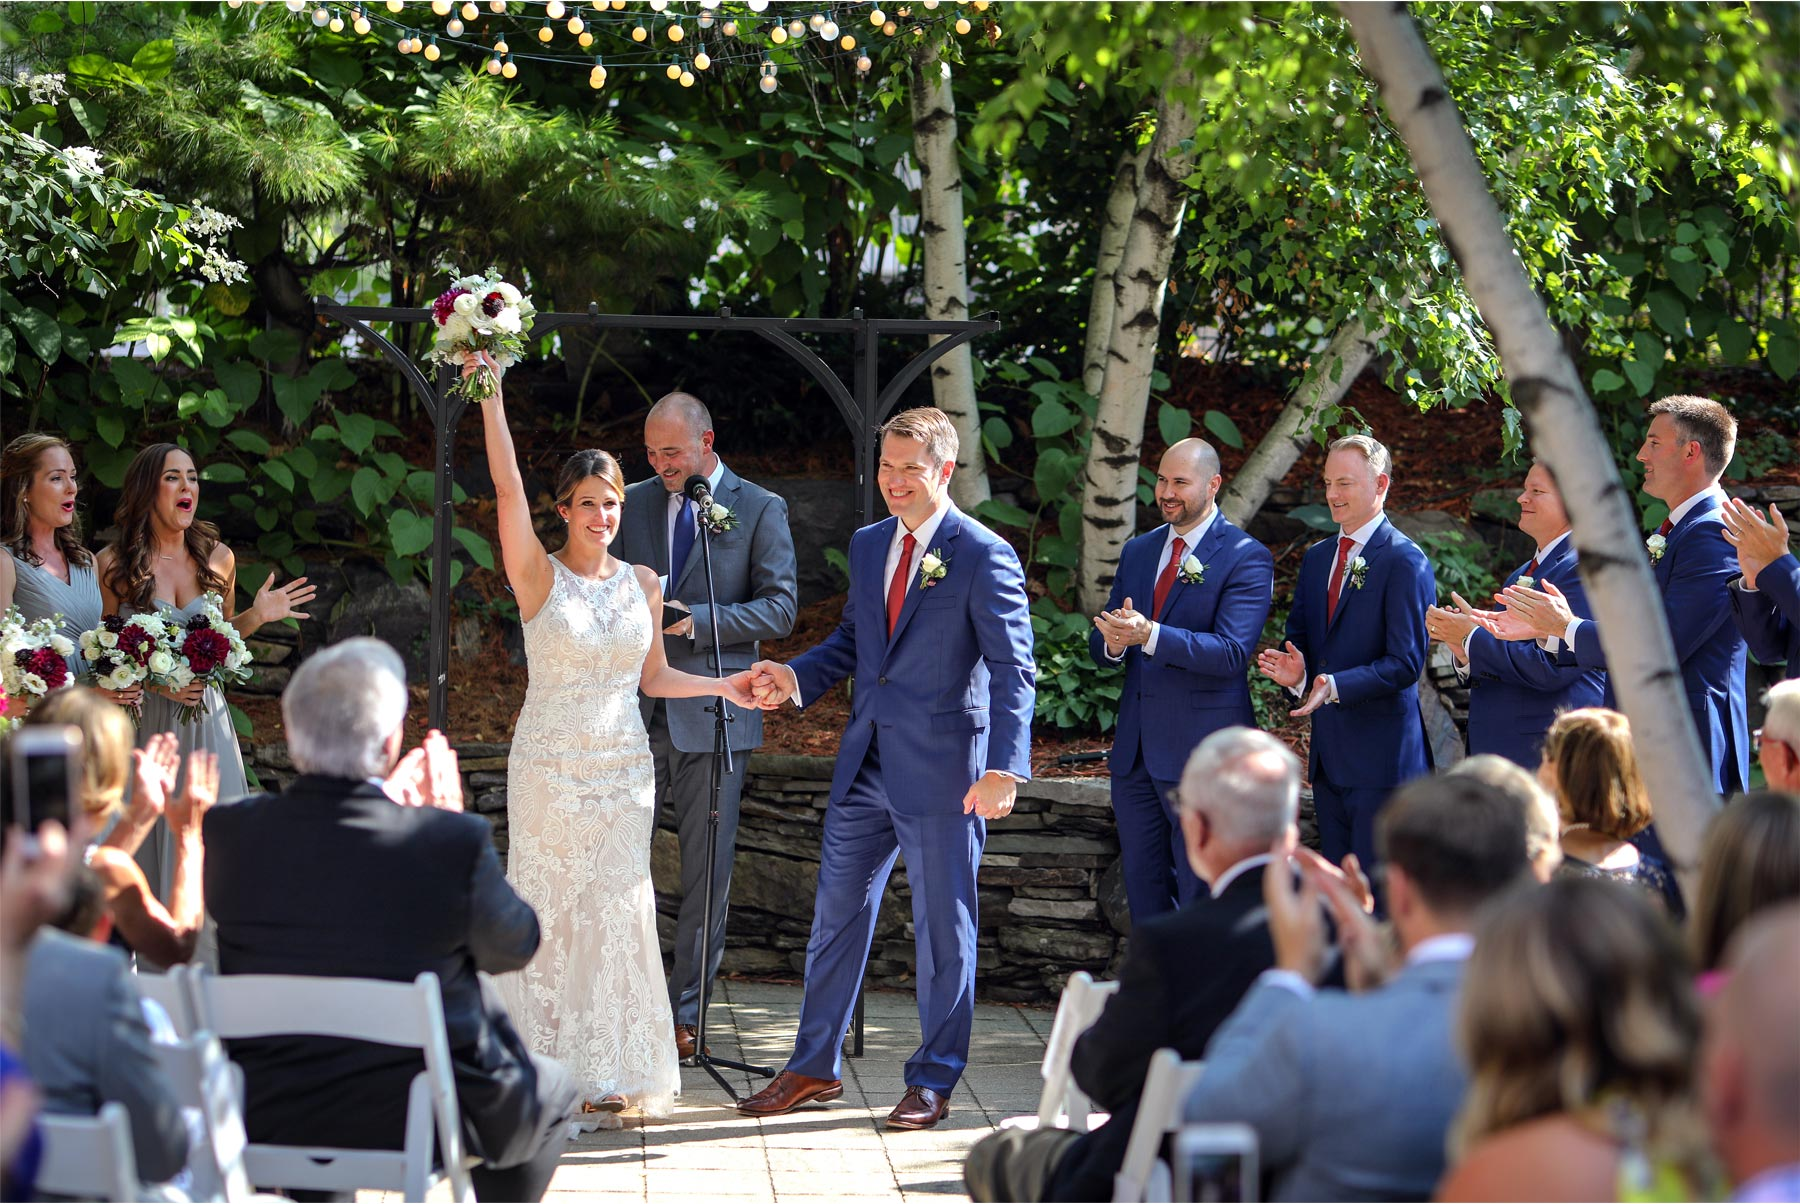 15-Minneapolis-Minnesota-Wedding-Photographer-by-Vick-Photography-Van-Dusen-Mansion-Outdoor-Ceremony-Megan-and-Ned.jpg